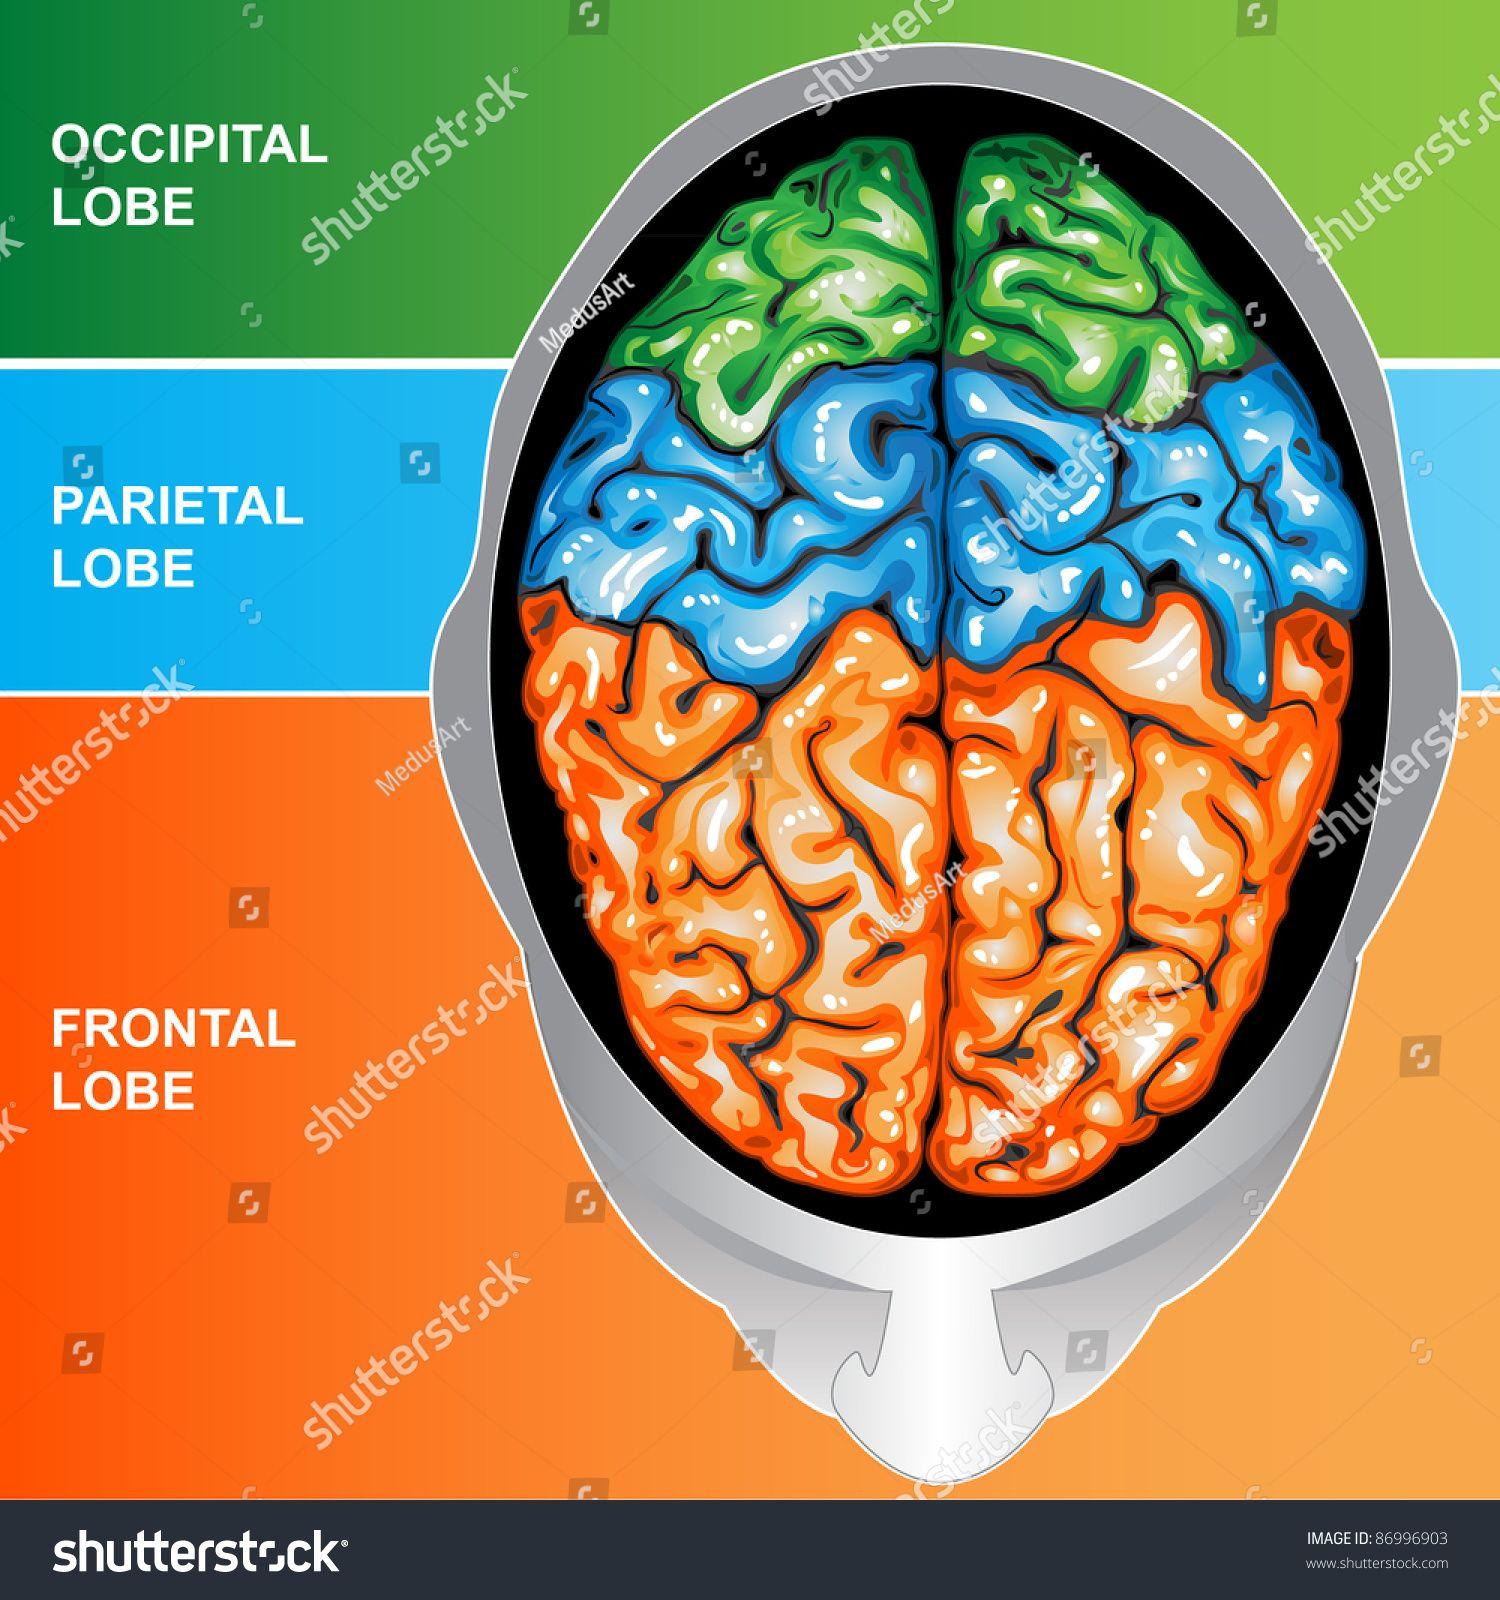 Human Brain View Top Ad Affiliate Brain Human Top View Frontal Lobe Human Brain Best Movers [ 1600 x 1500 Pixel ]